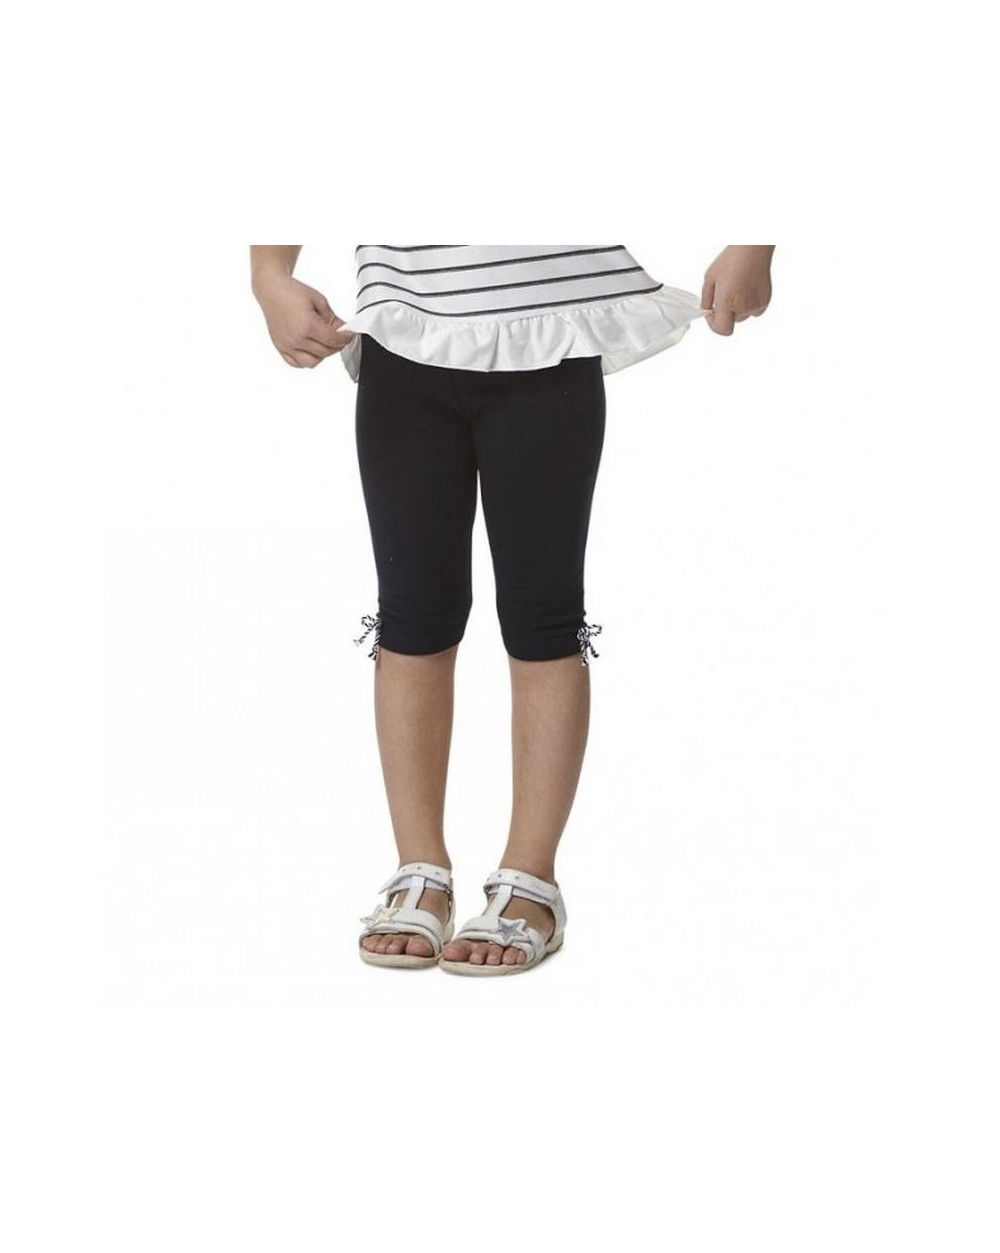 Legging enfant Hublot